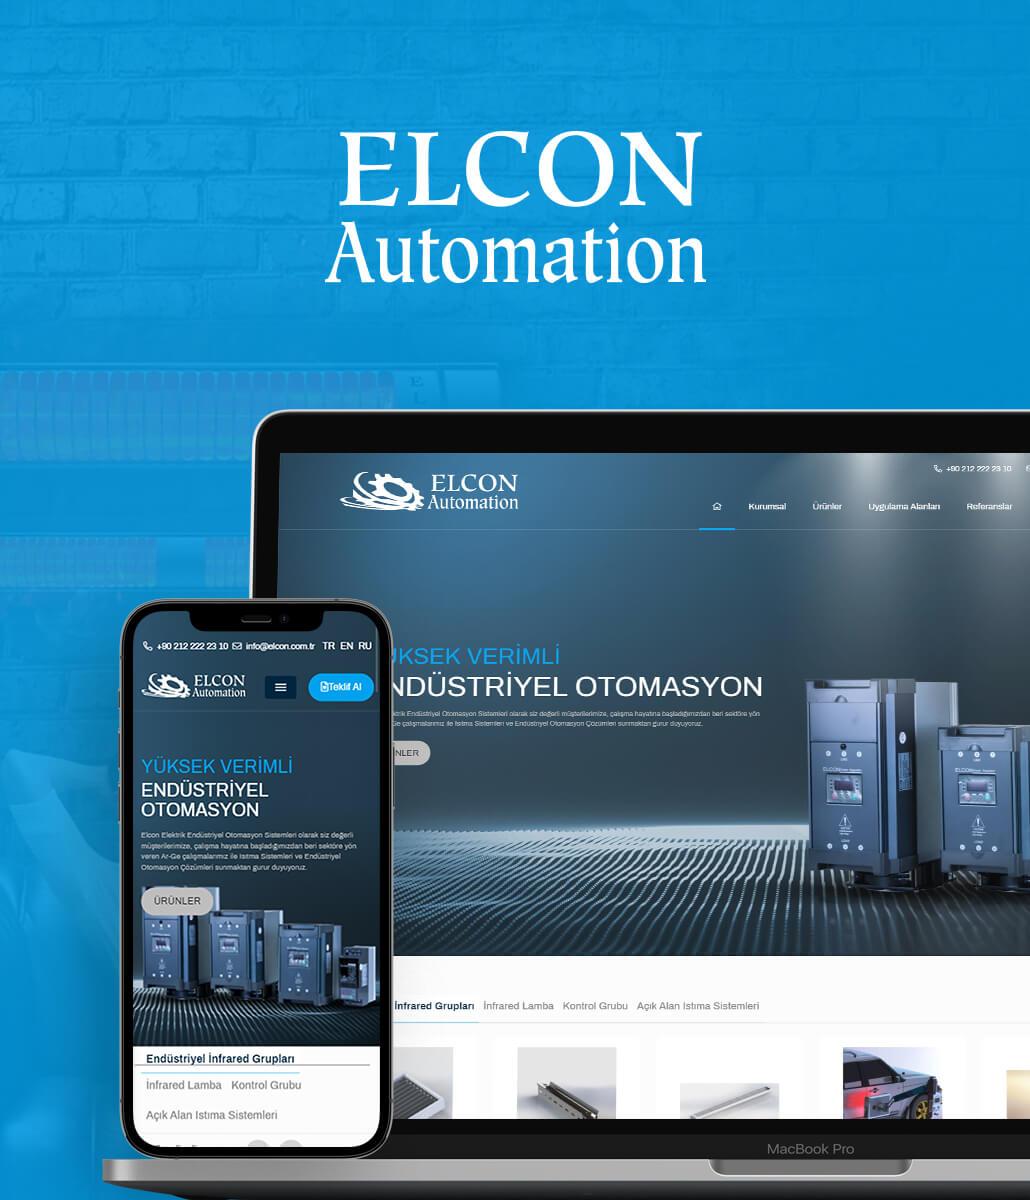 Elcon Automation Kurumsal Web Tasarım